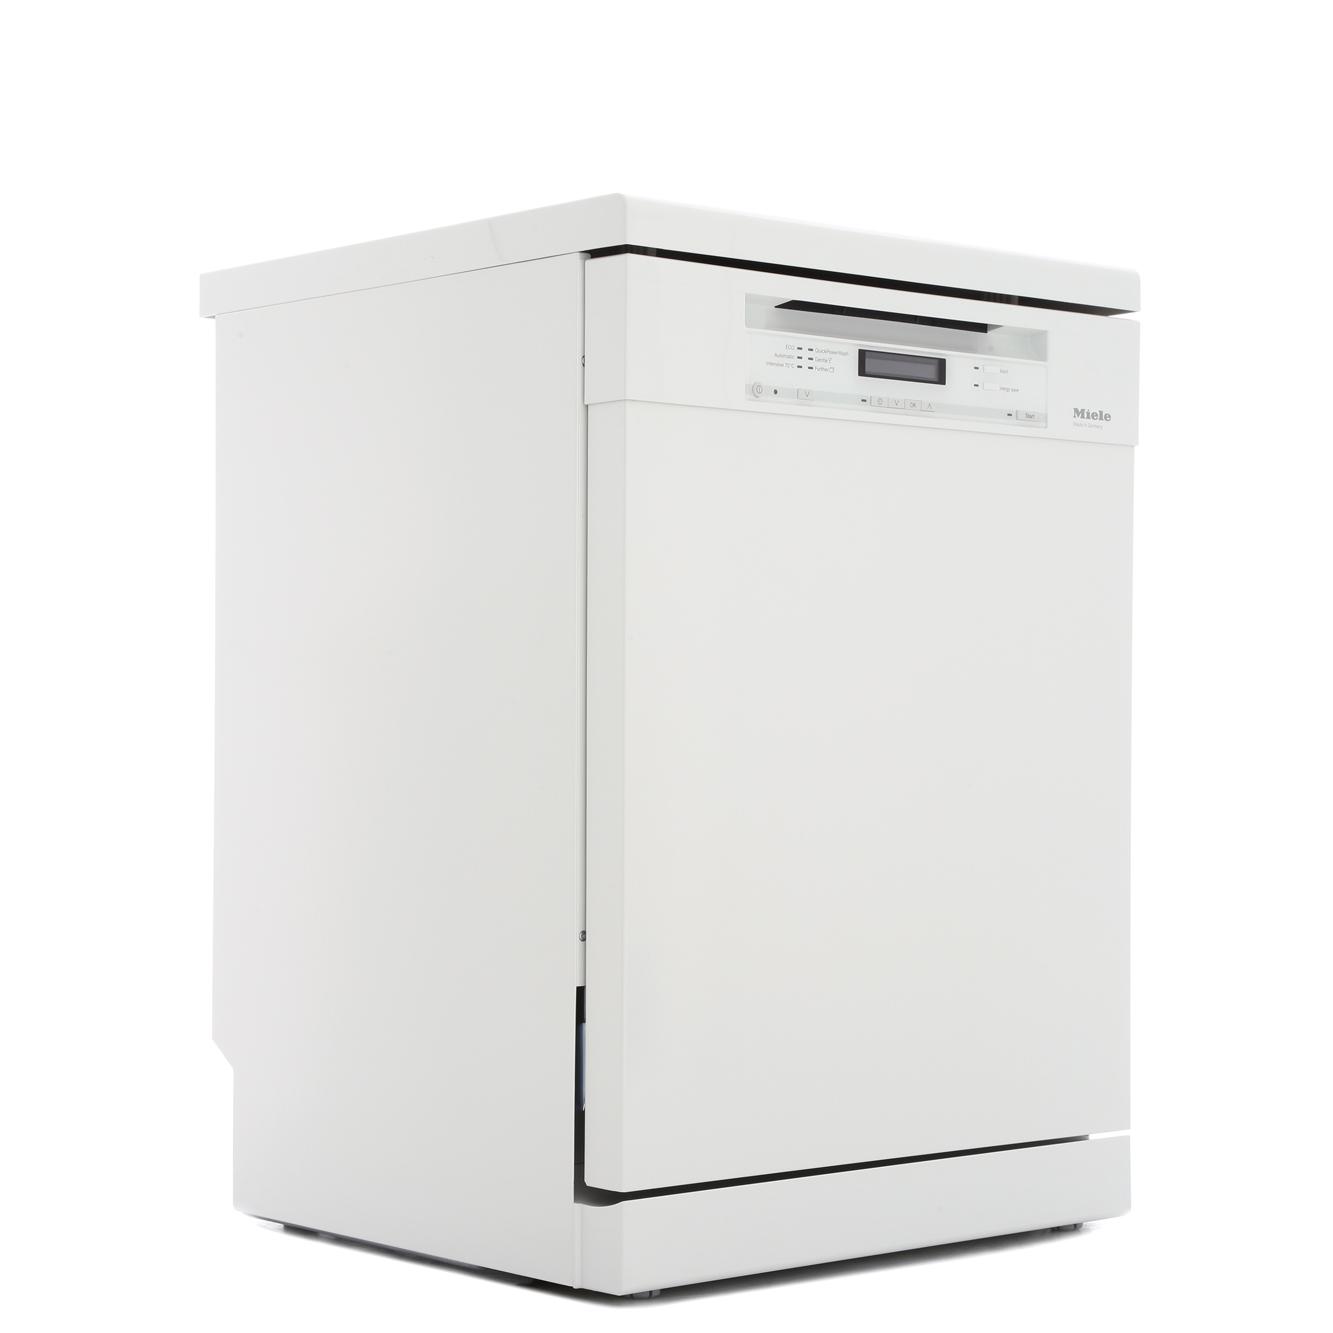 Buy Miele G6730sc Brilliant White Dishwasher G6730scbrwh